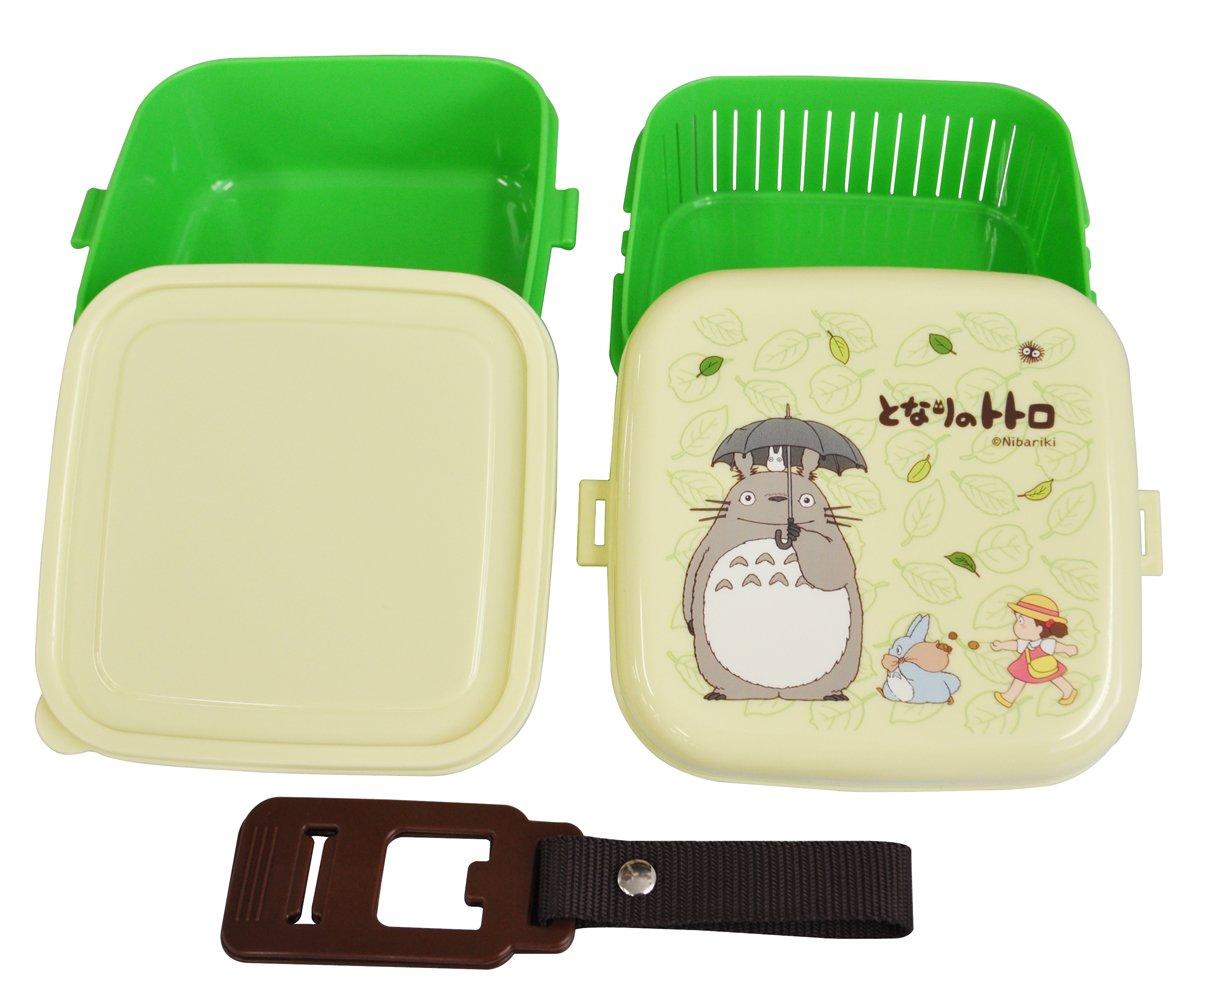 Totoro Bento Studio Ghibli Totoro Design 2-Tier Bento Lunch Box, 620 mL Plus 630 mL